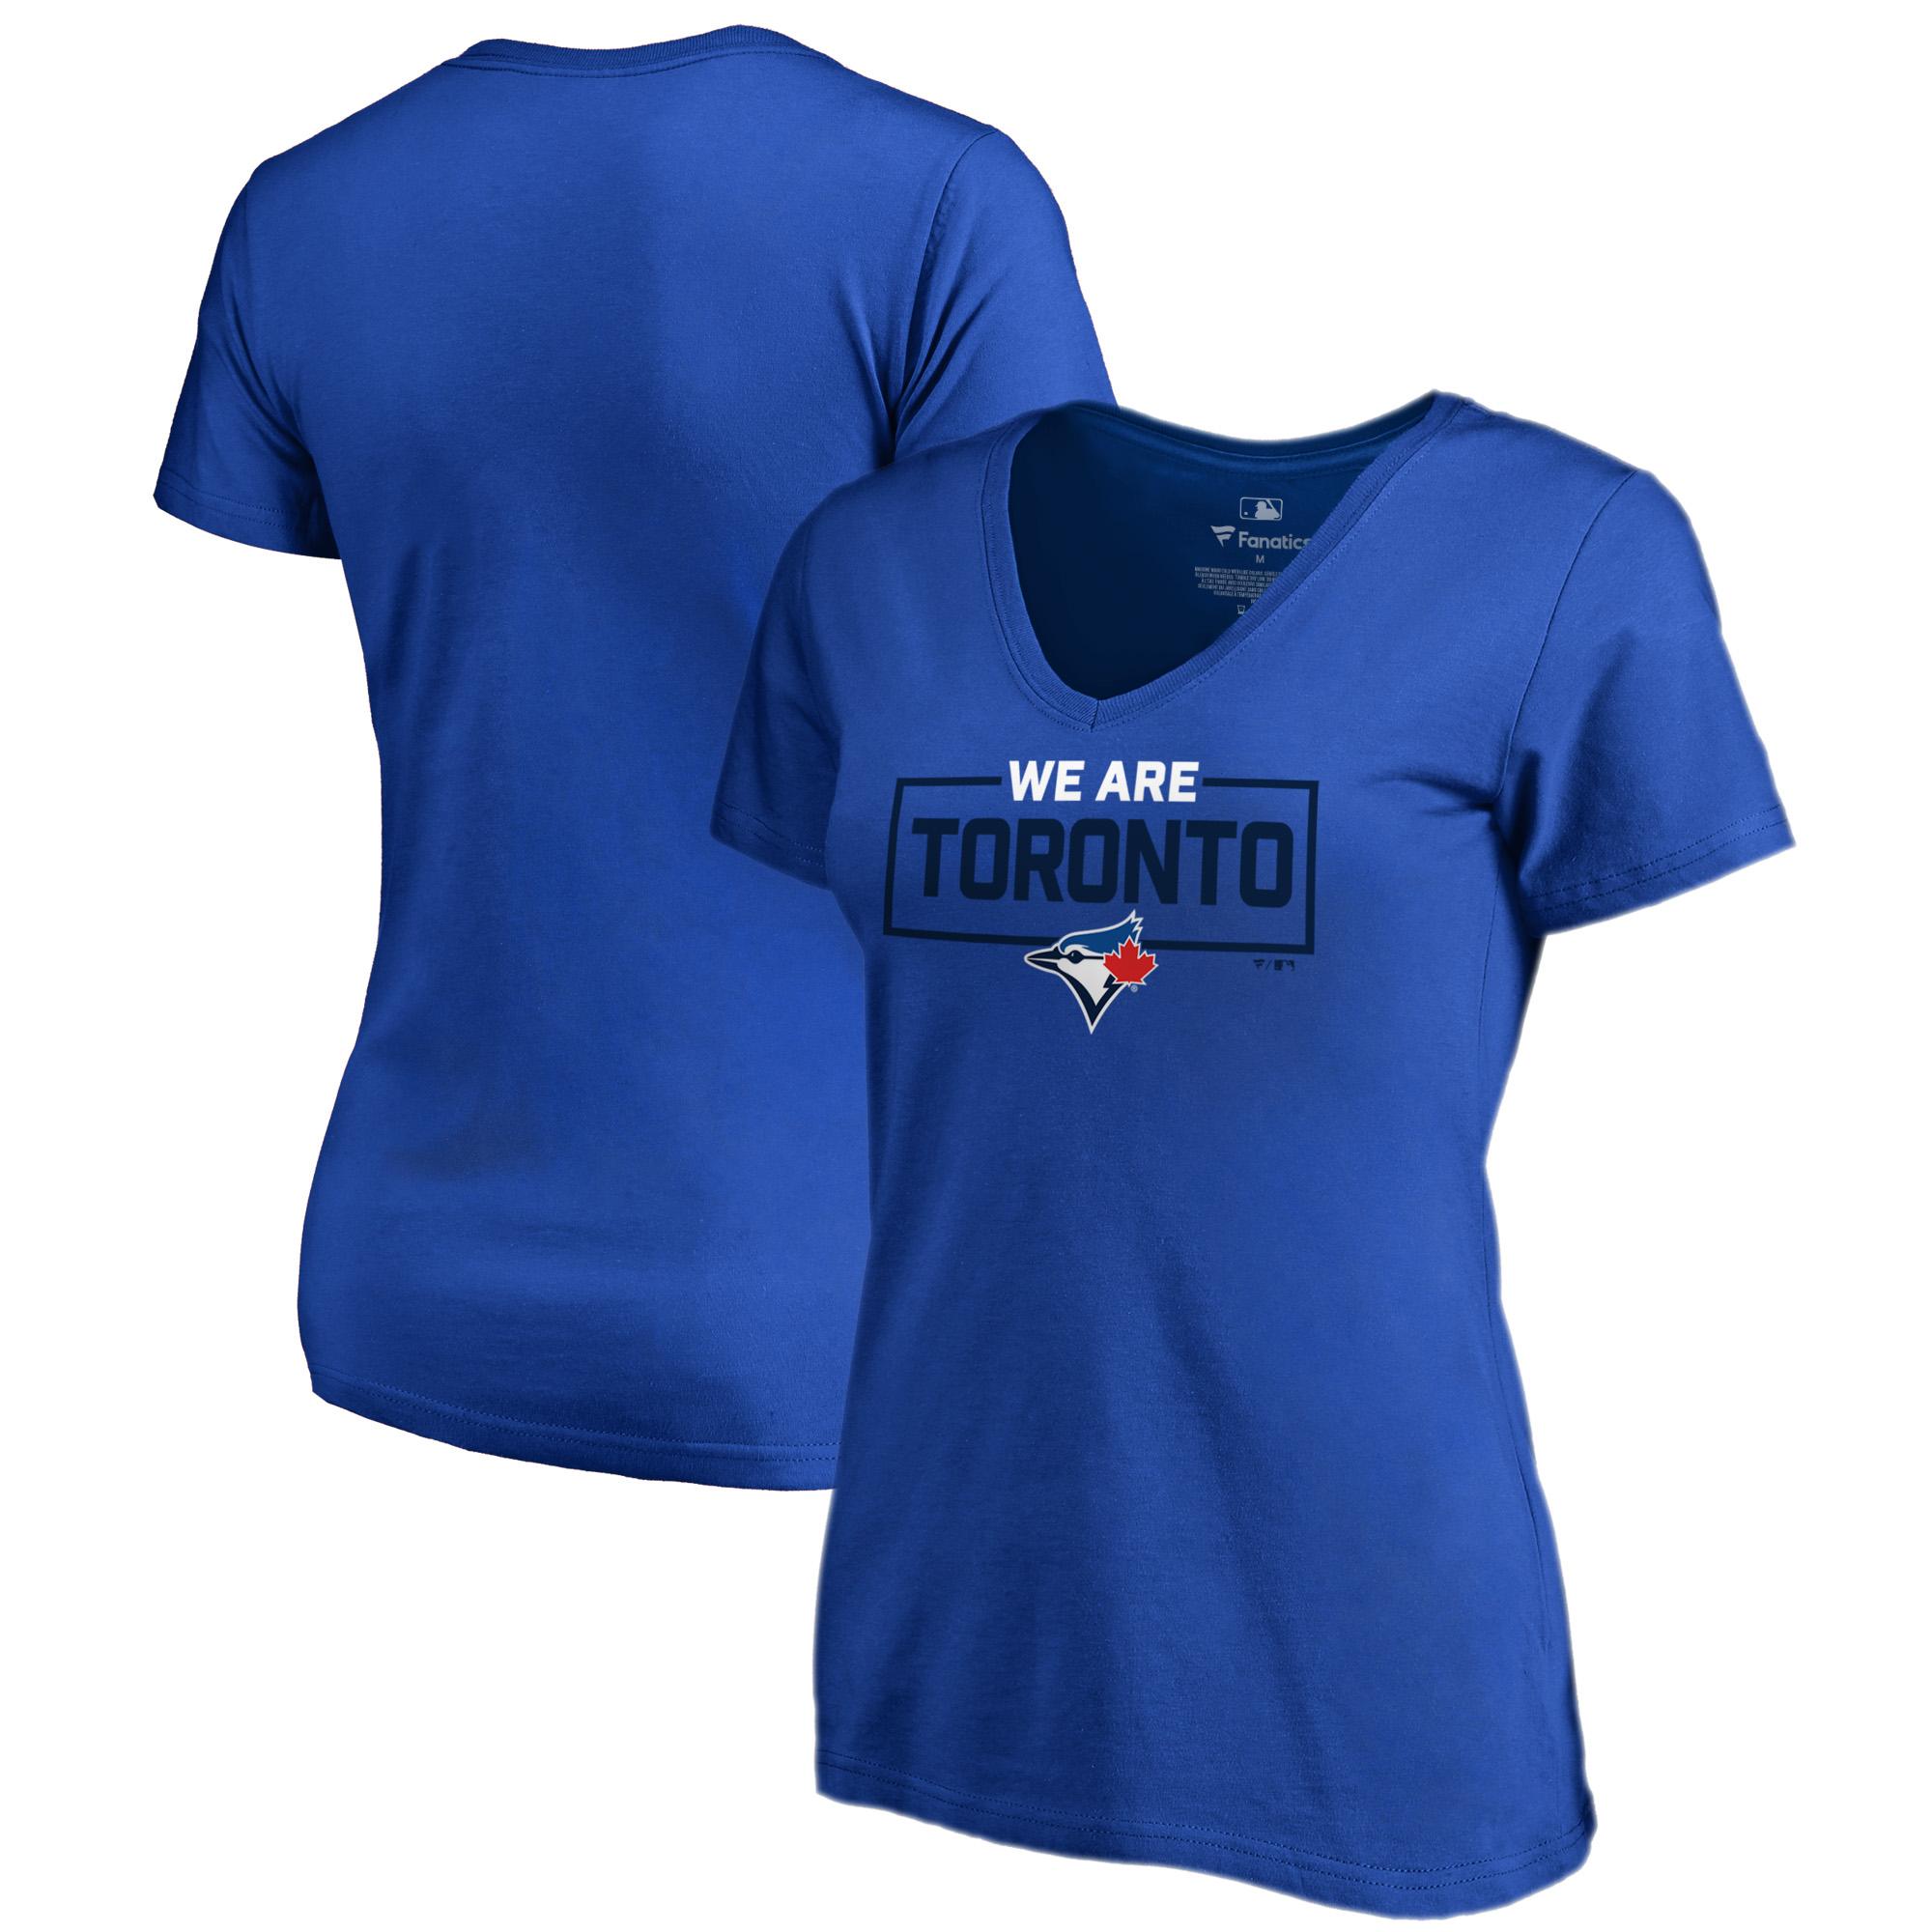 Toronto Blue Jays Fanatics Branded Women's Plus Size We Are Icon V-Neck T-Shirt - Royal